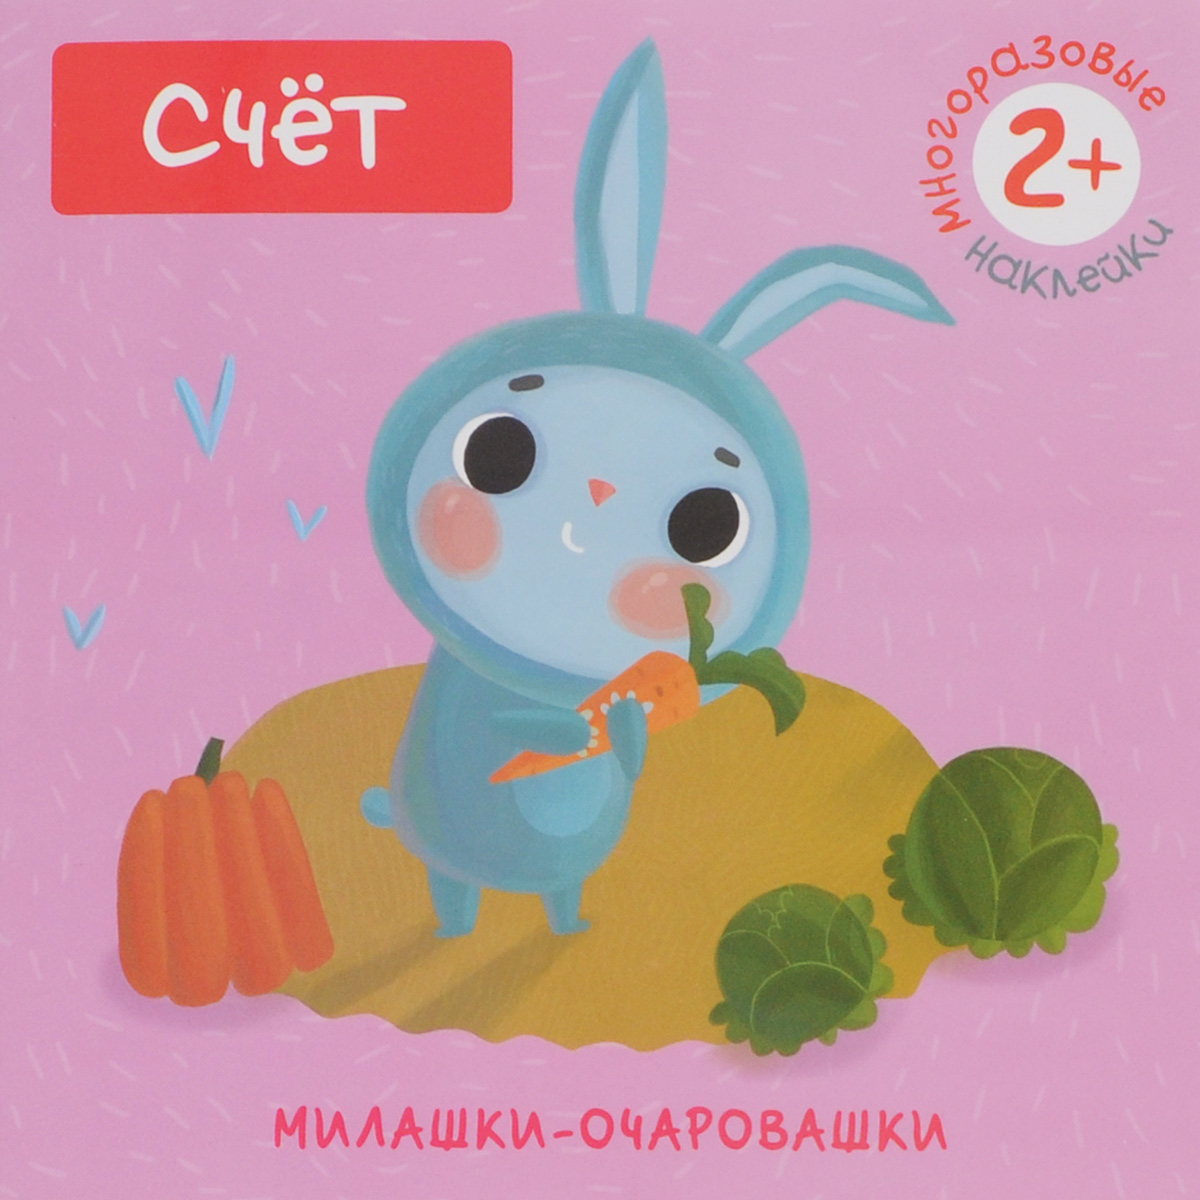 Мария Романова Счет (+ наклейки) романова мария цыпленок